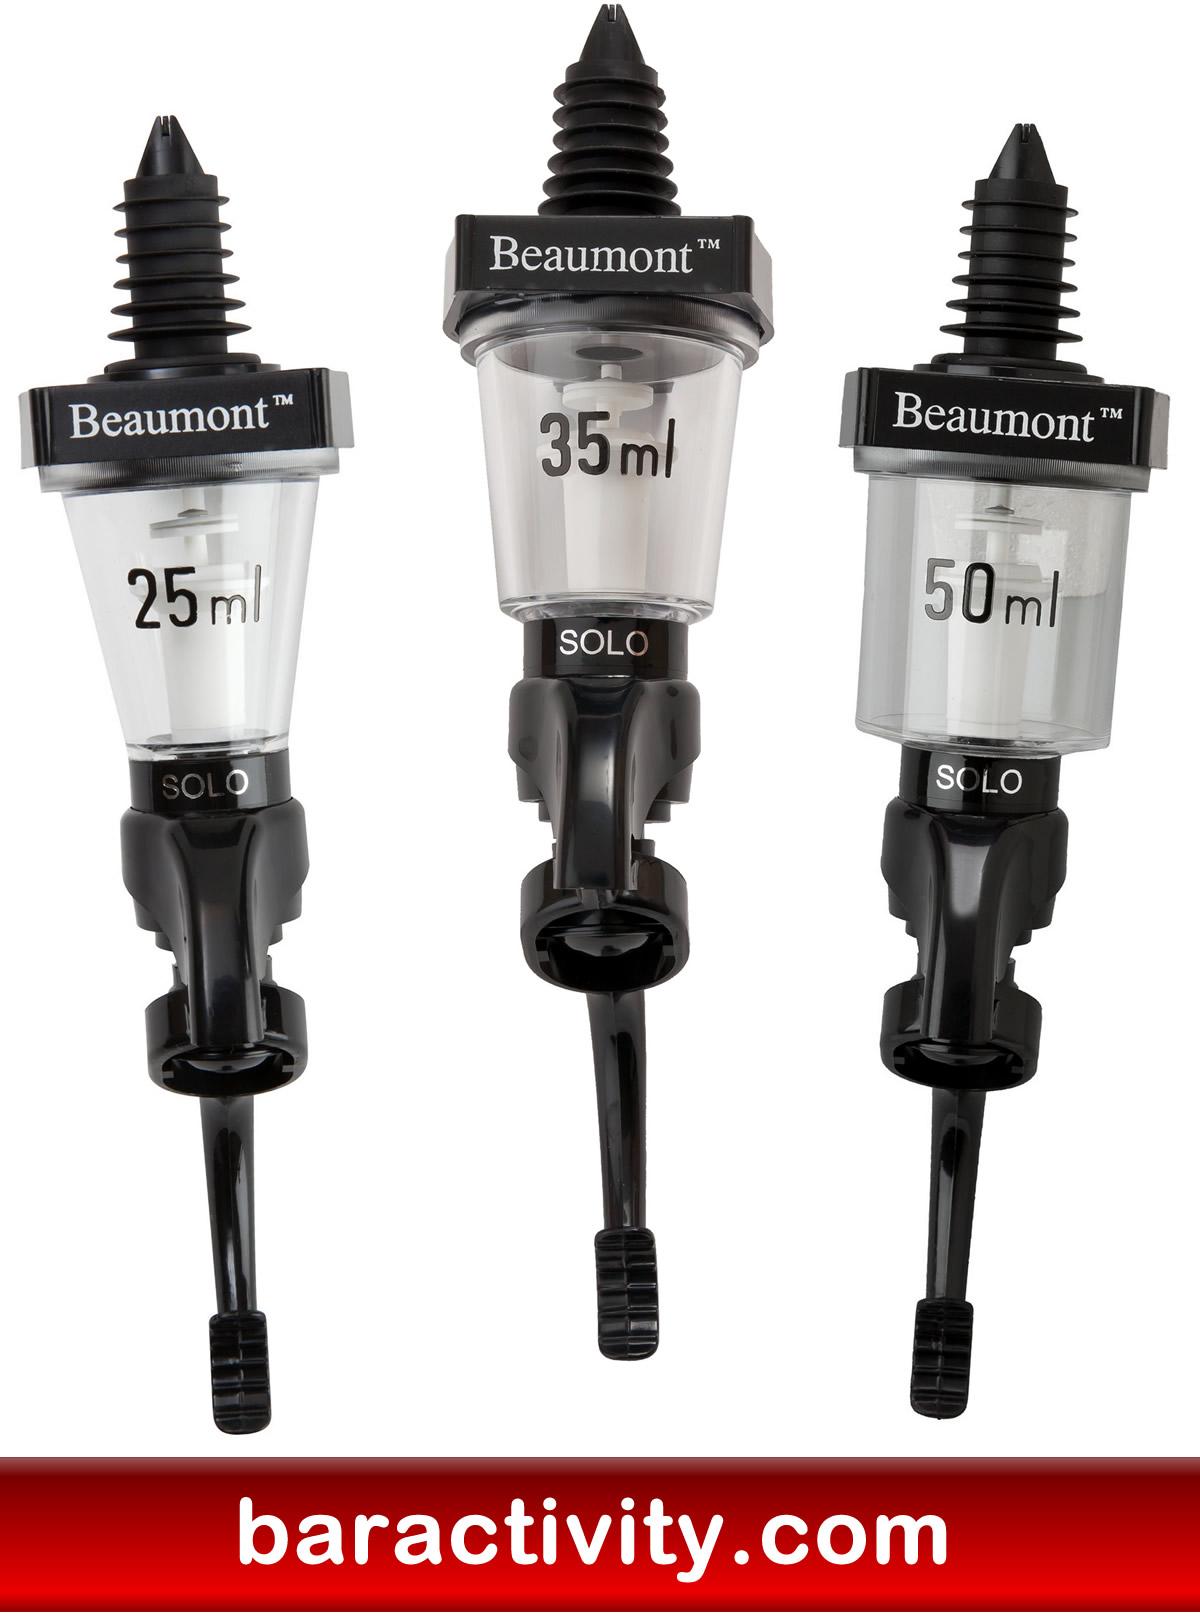 Beaumont Solo Professional Bar Optic Spirit Measure Fast